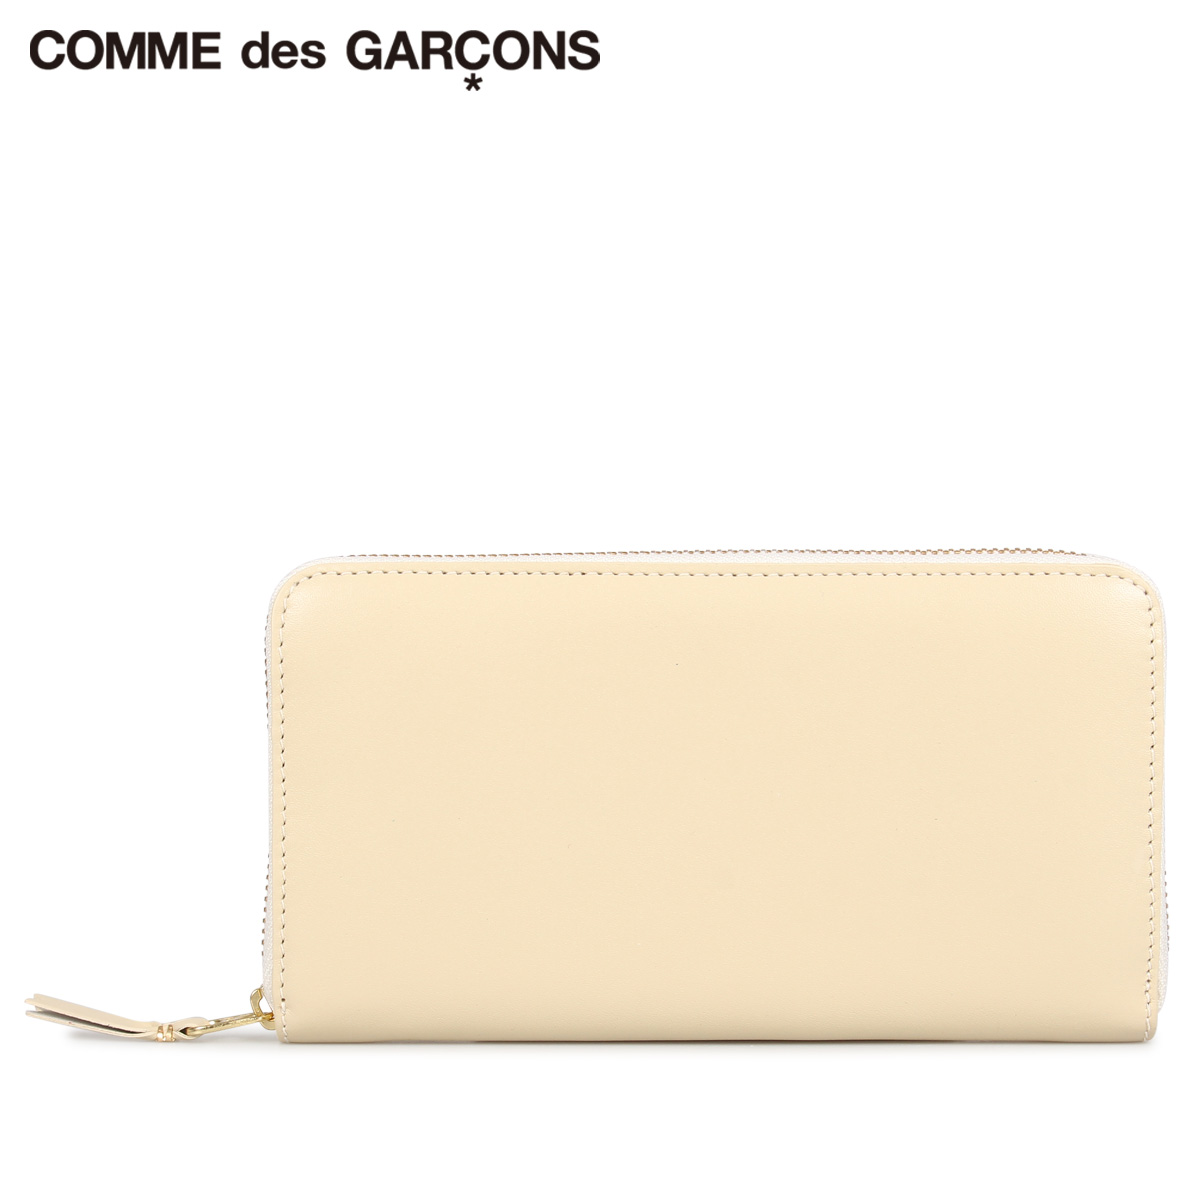 COMME des GARCONS CLASSIC WALLET コムデギャルソン 財布 長財布 メンズ レディース ラウンドファスナー 本革 オフ ホワイト SA0111